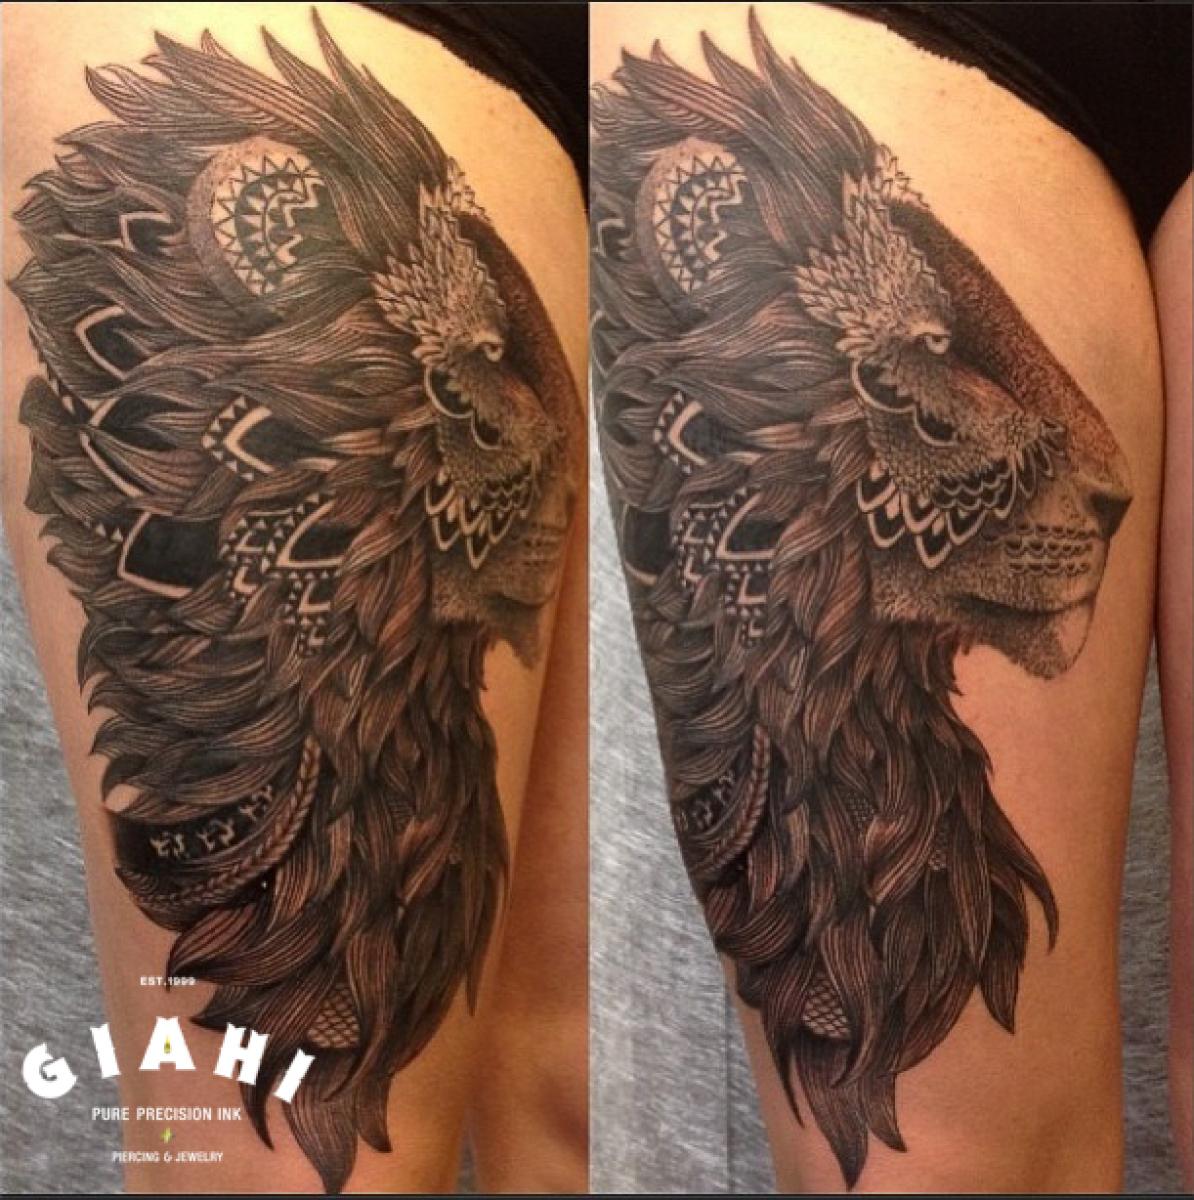 Ethnic Mane Liwon Blackwork tattoo by Roony